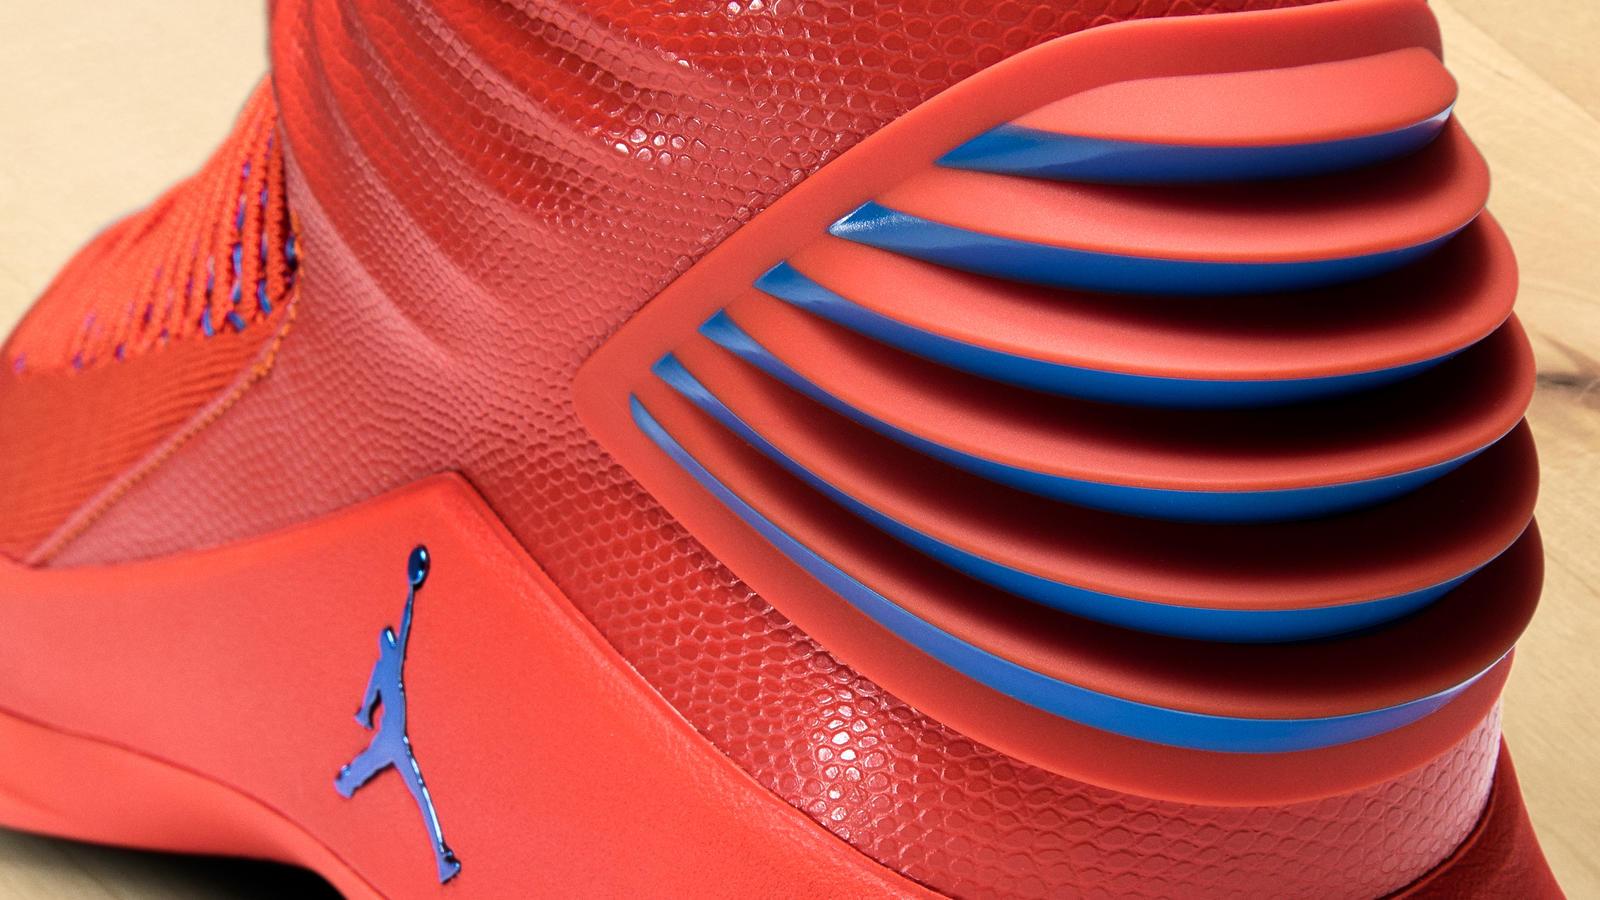 69120a3669927f Air Jordan XXXII Russell Westbrook PE - Nike News